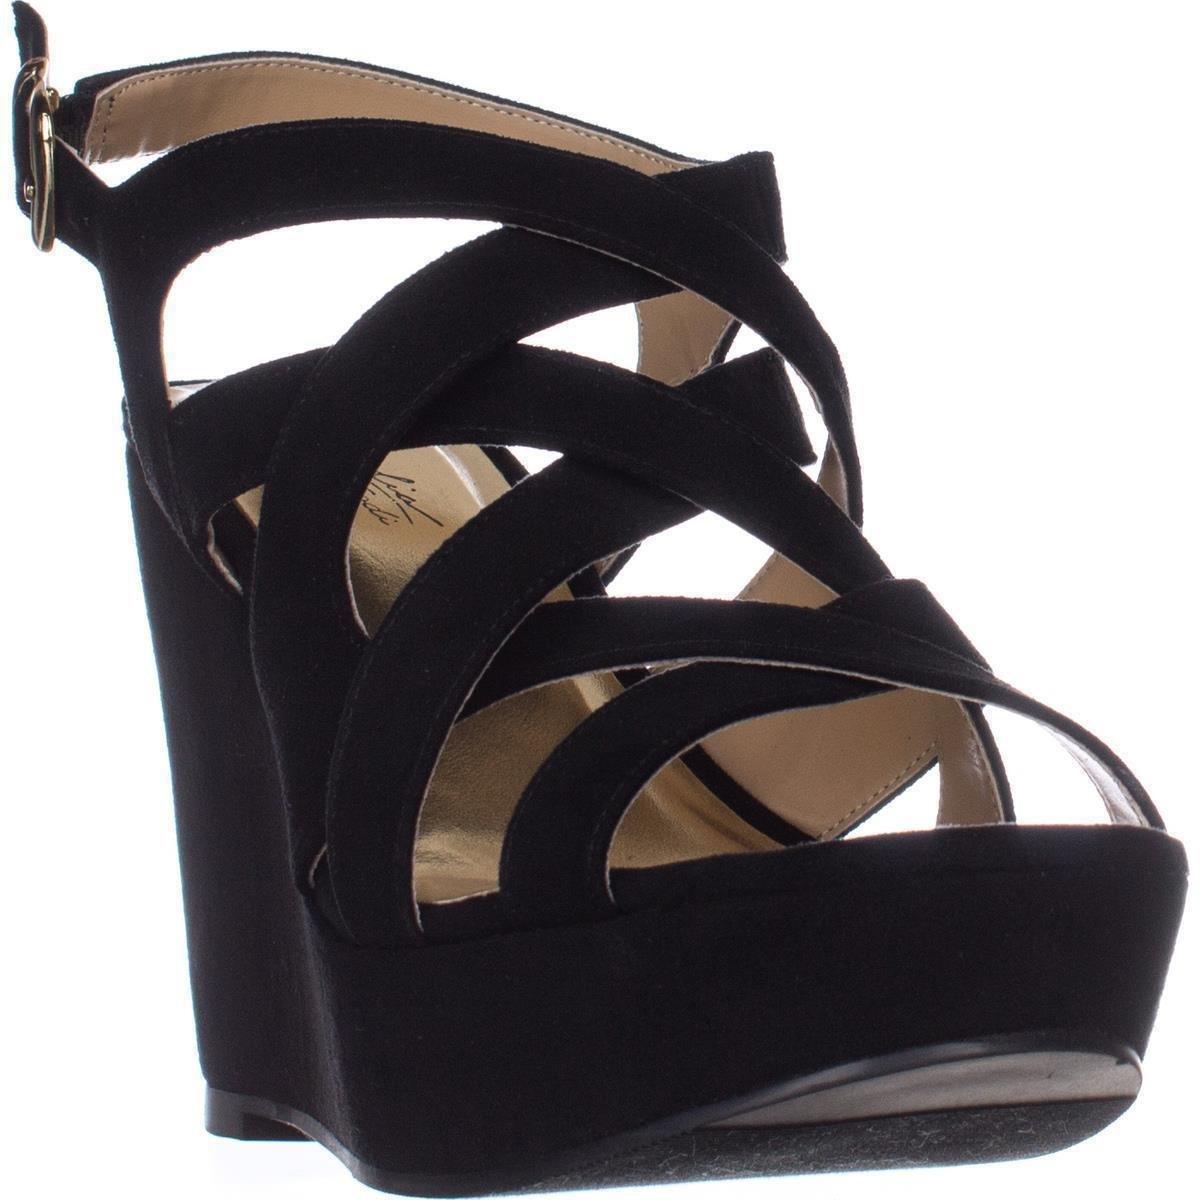 Thalia Sodi Womens MADDORAF Peep Toe Casual Strappy Sandals B07BFHJYBX 7 B(M) US Black